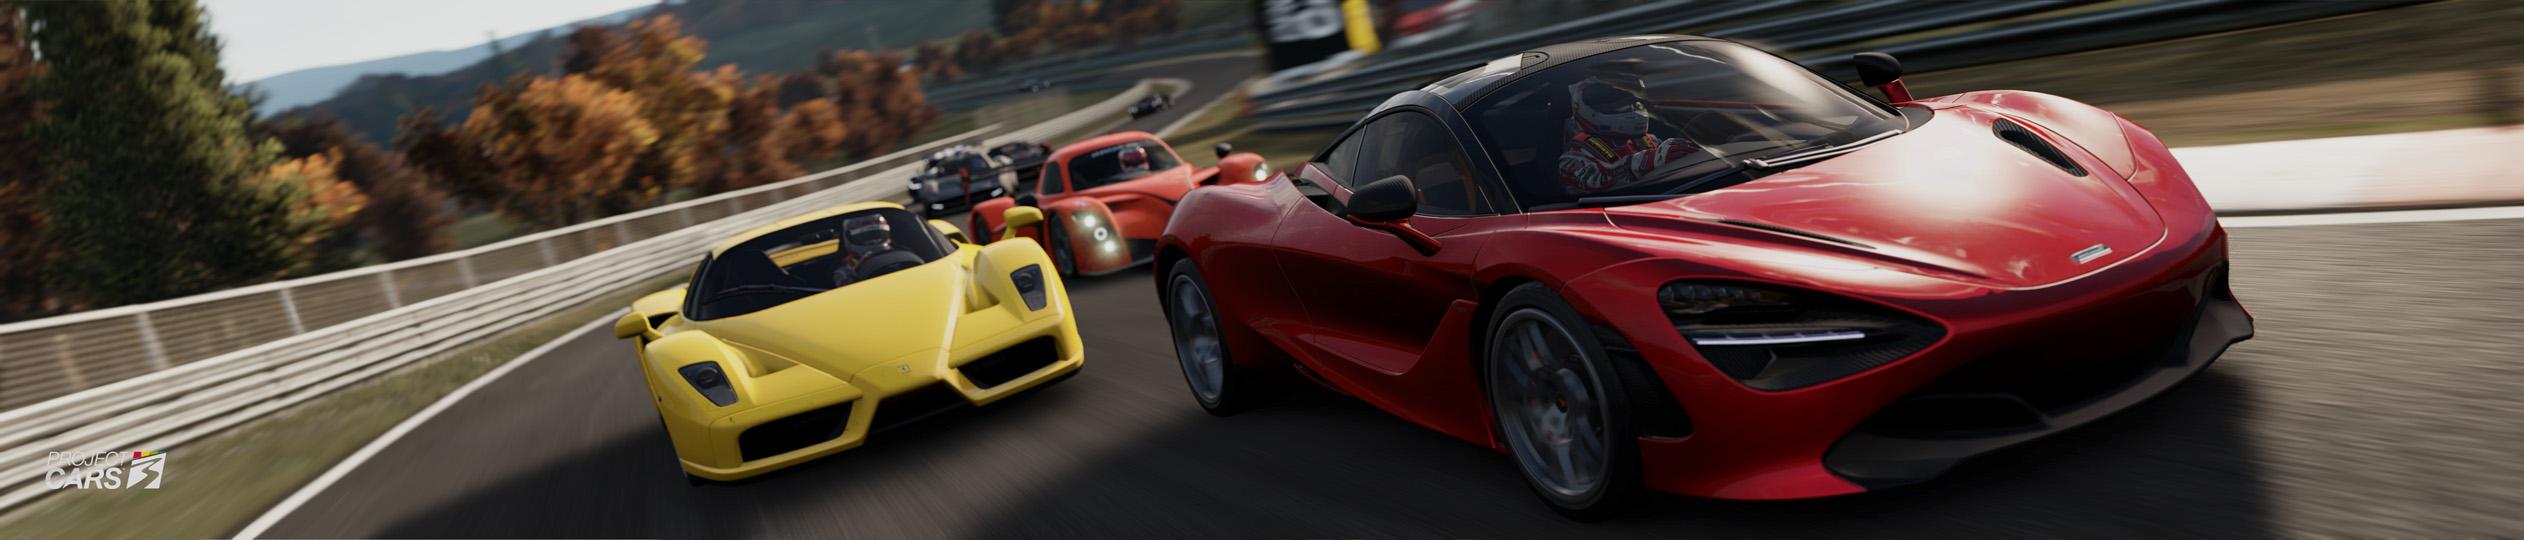 2 PROJECT CARS 3 NORDS crop copy.jpg